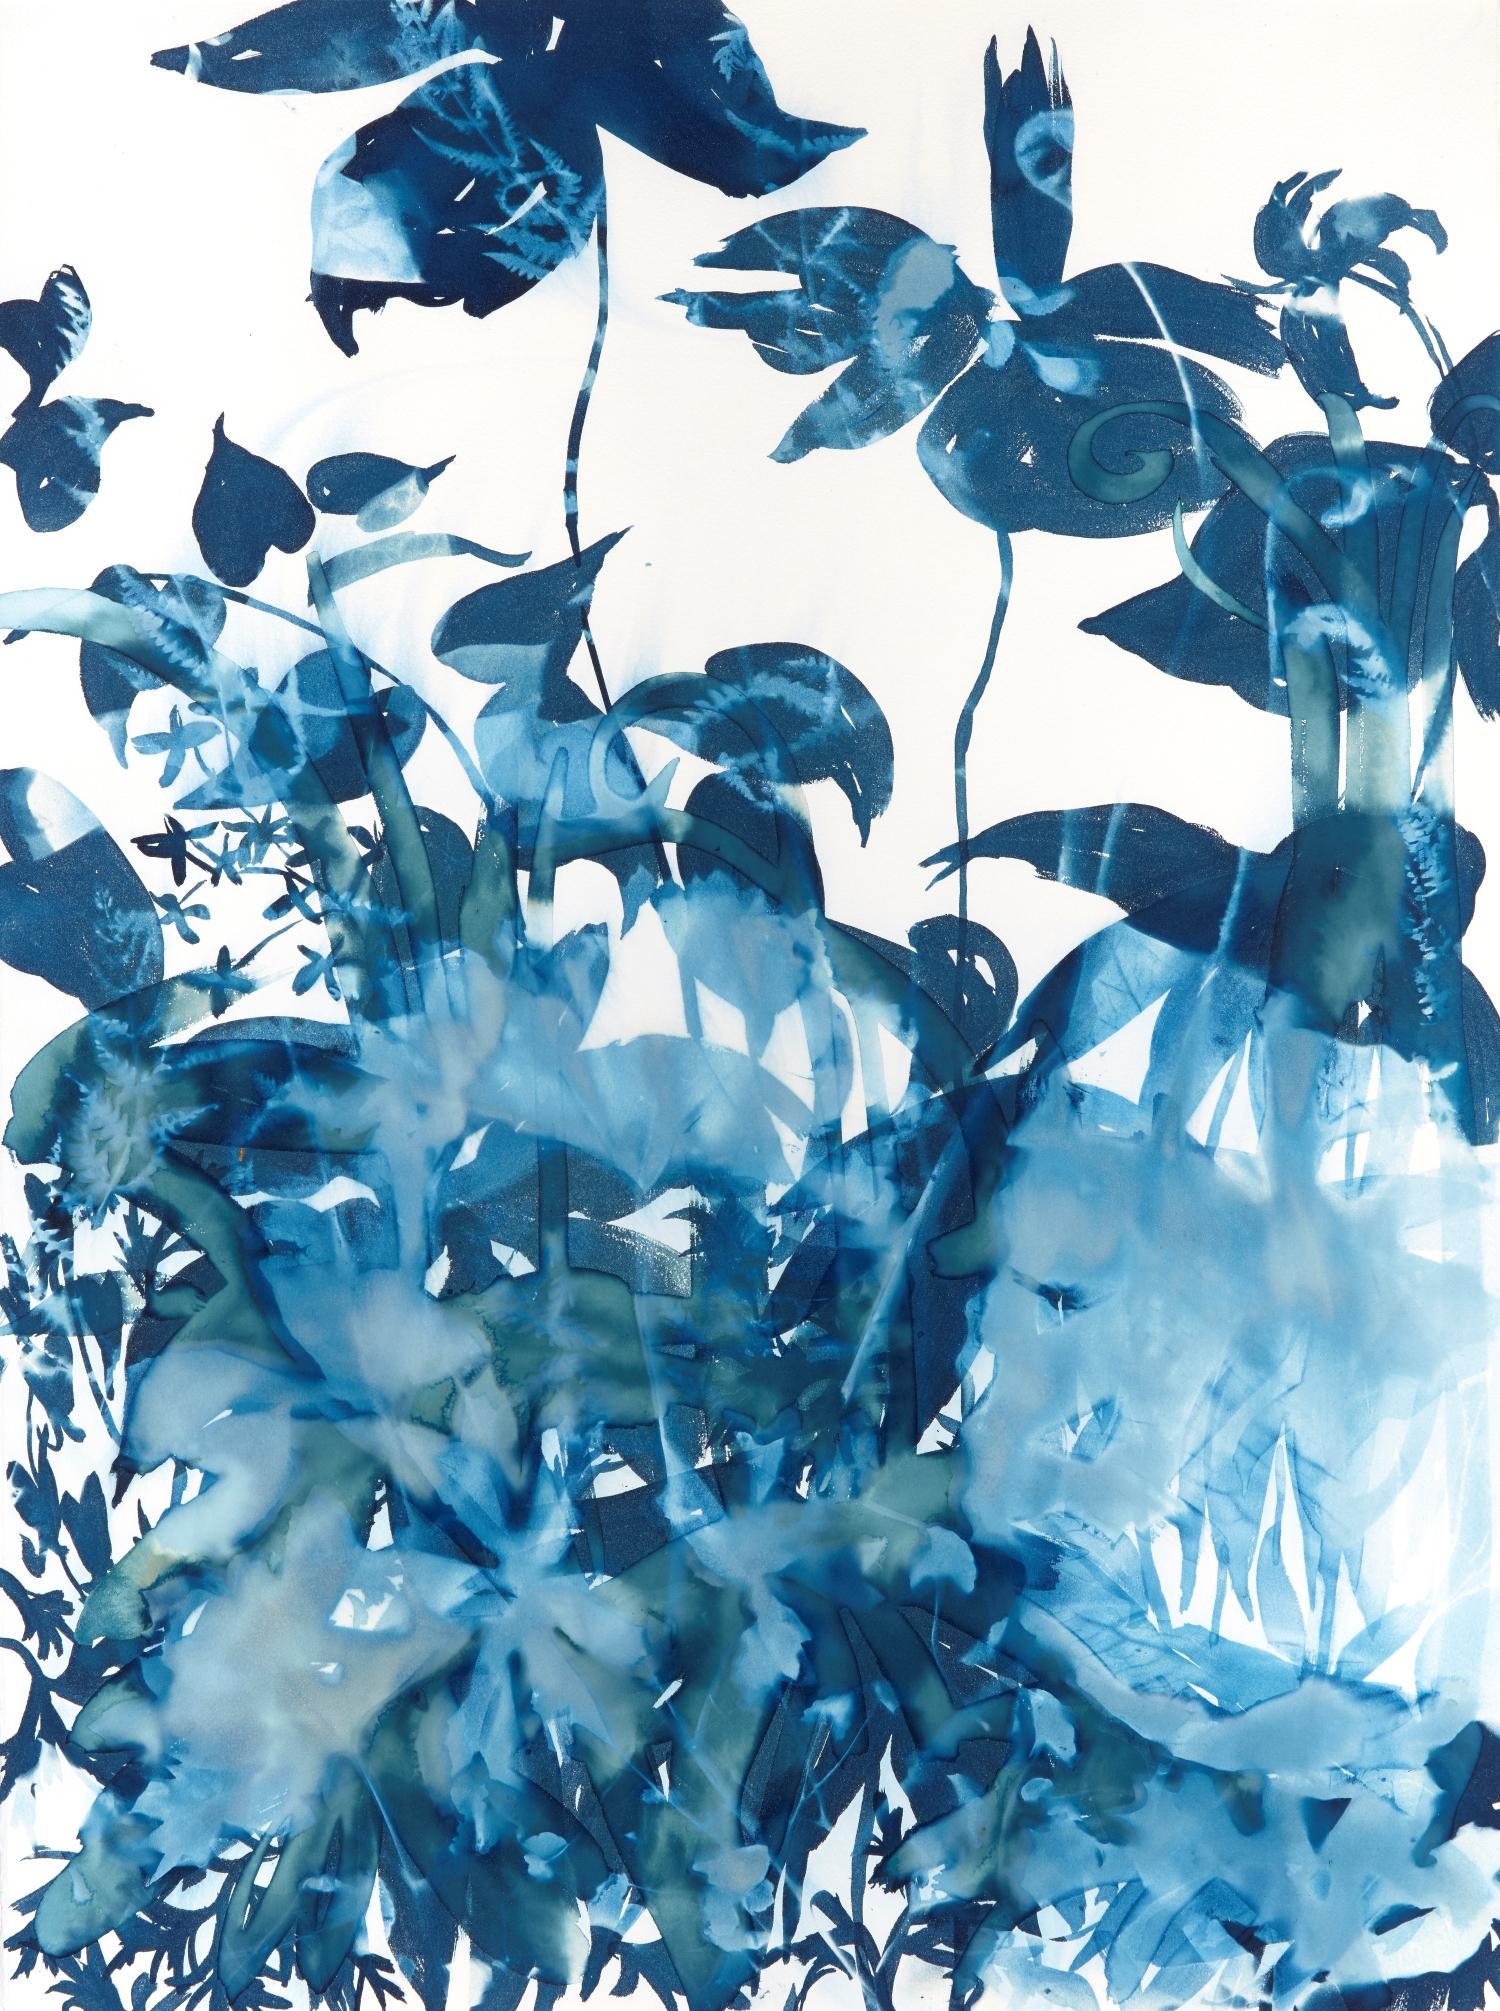 Ephemeral 1, Botanical,  Floral, Cyanotype, Blue, Work on Paper, Flowers